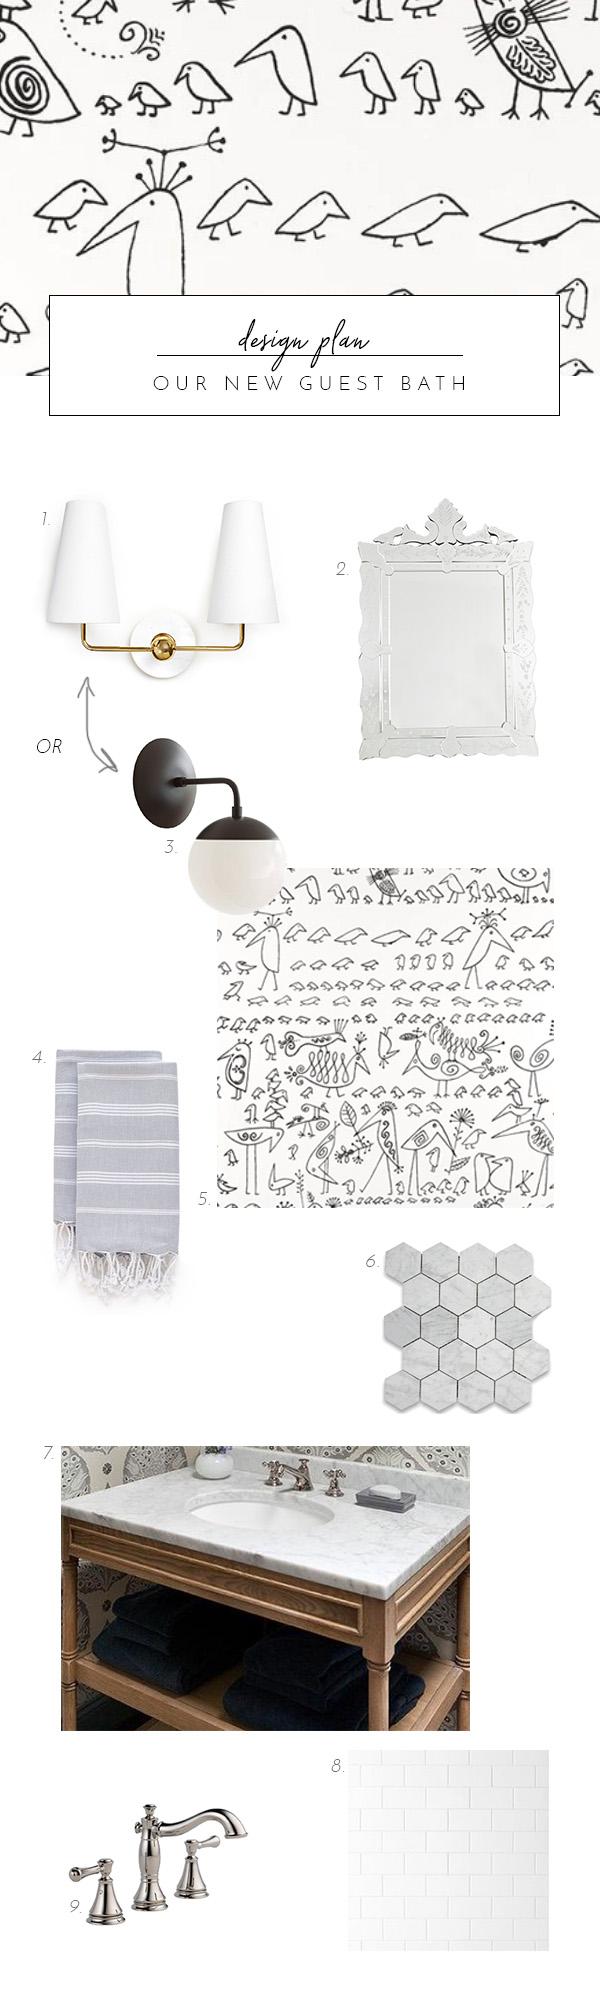 guest-bath-design